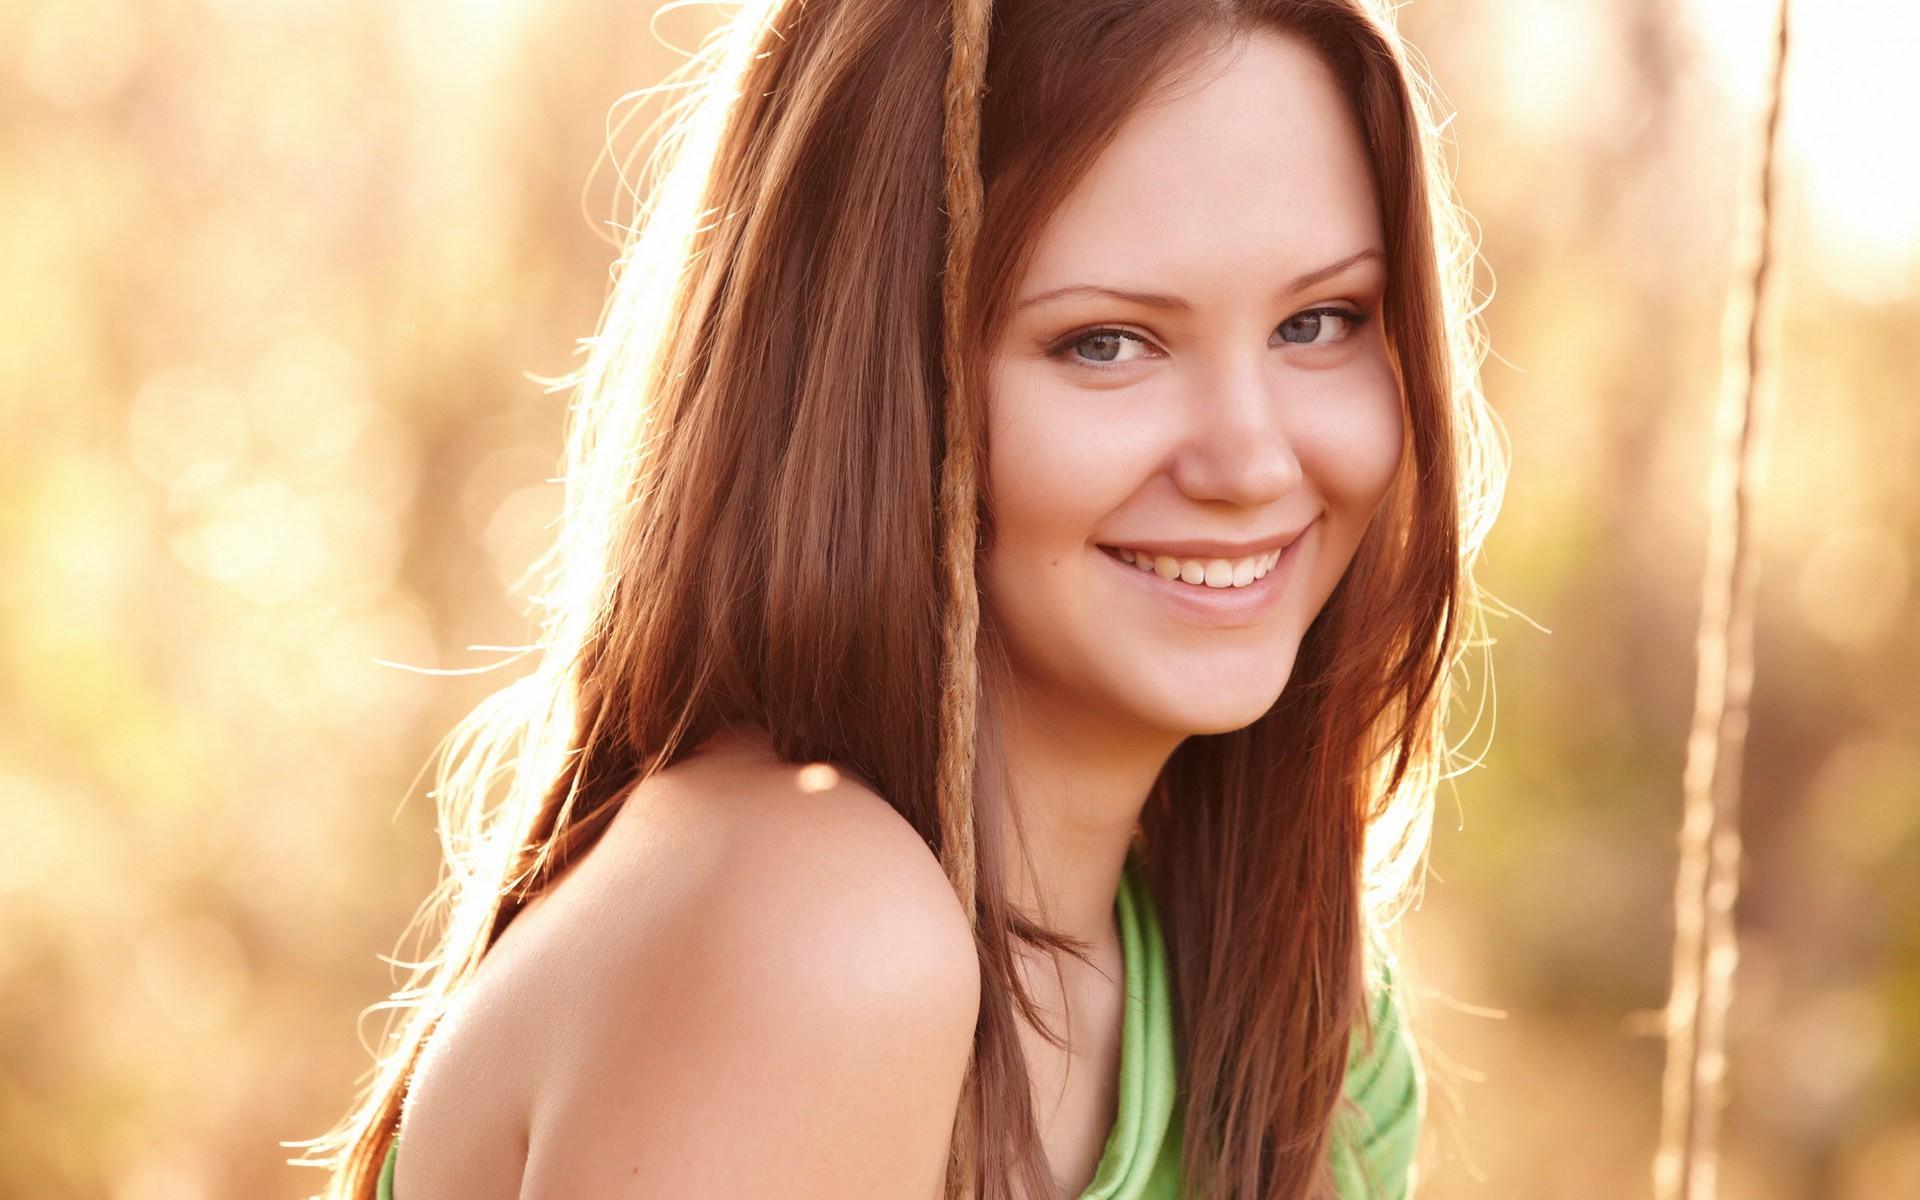 Счастливая девушка картинки без макияжа